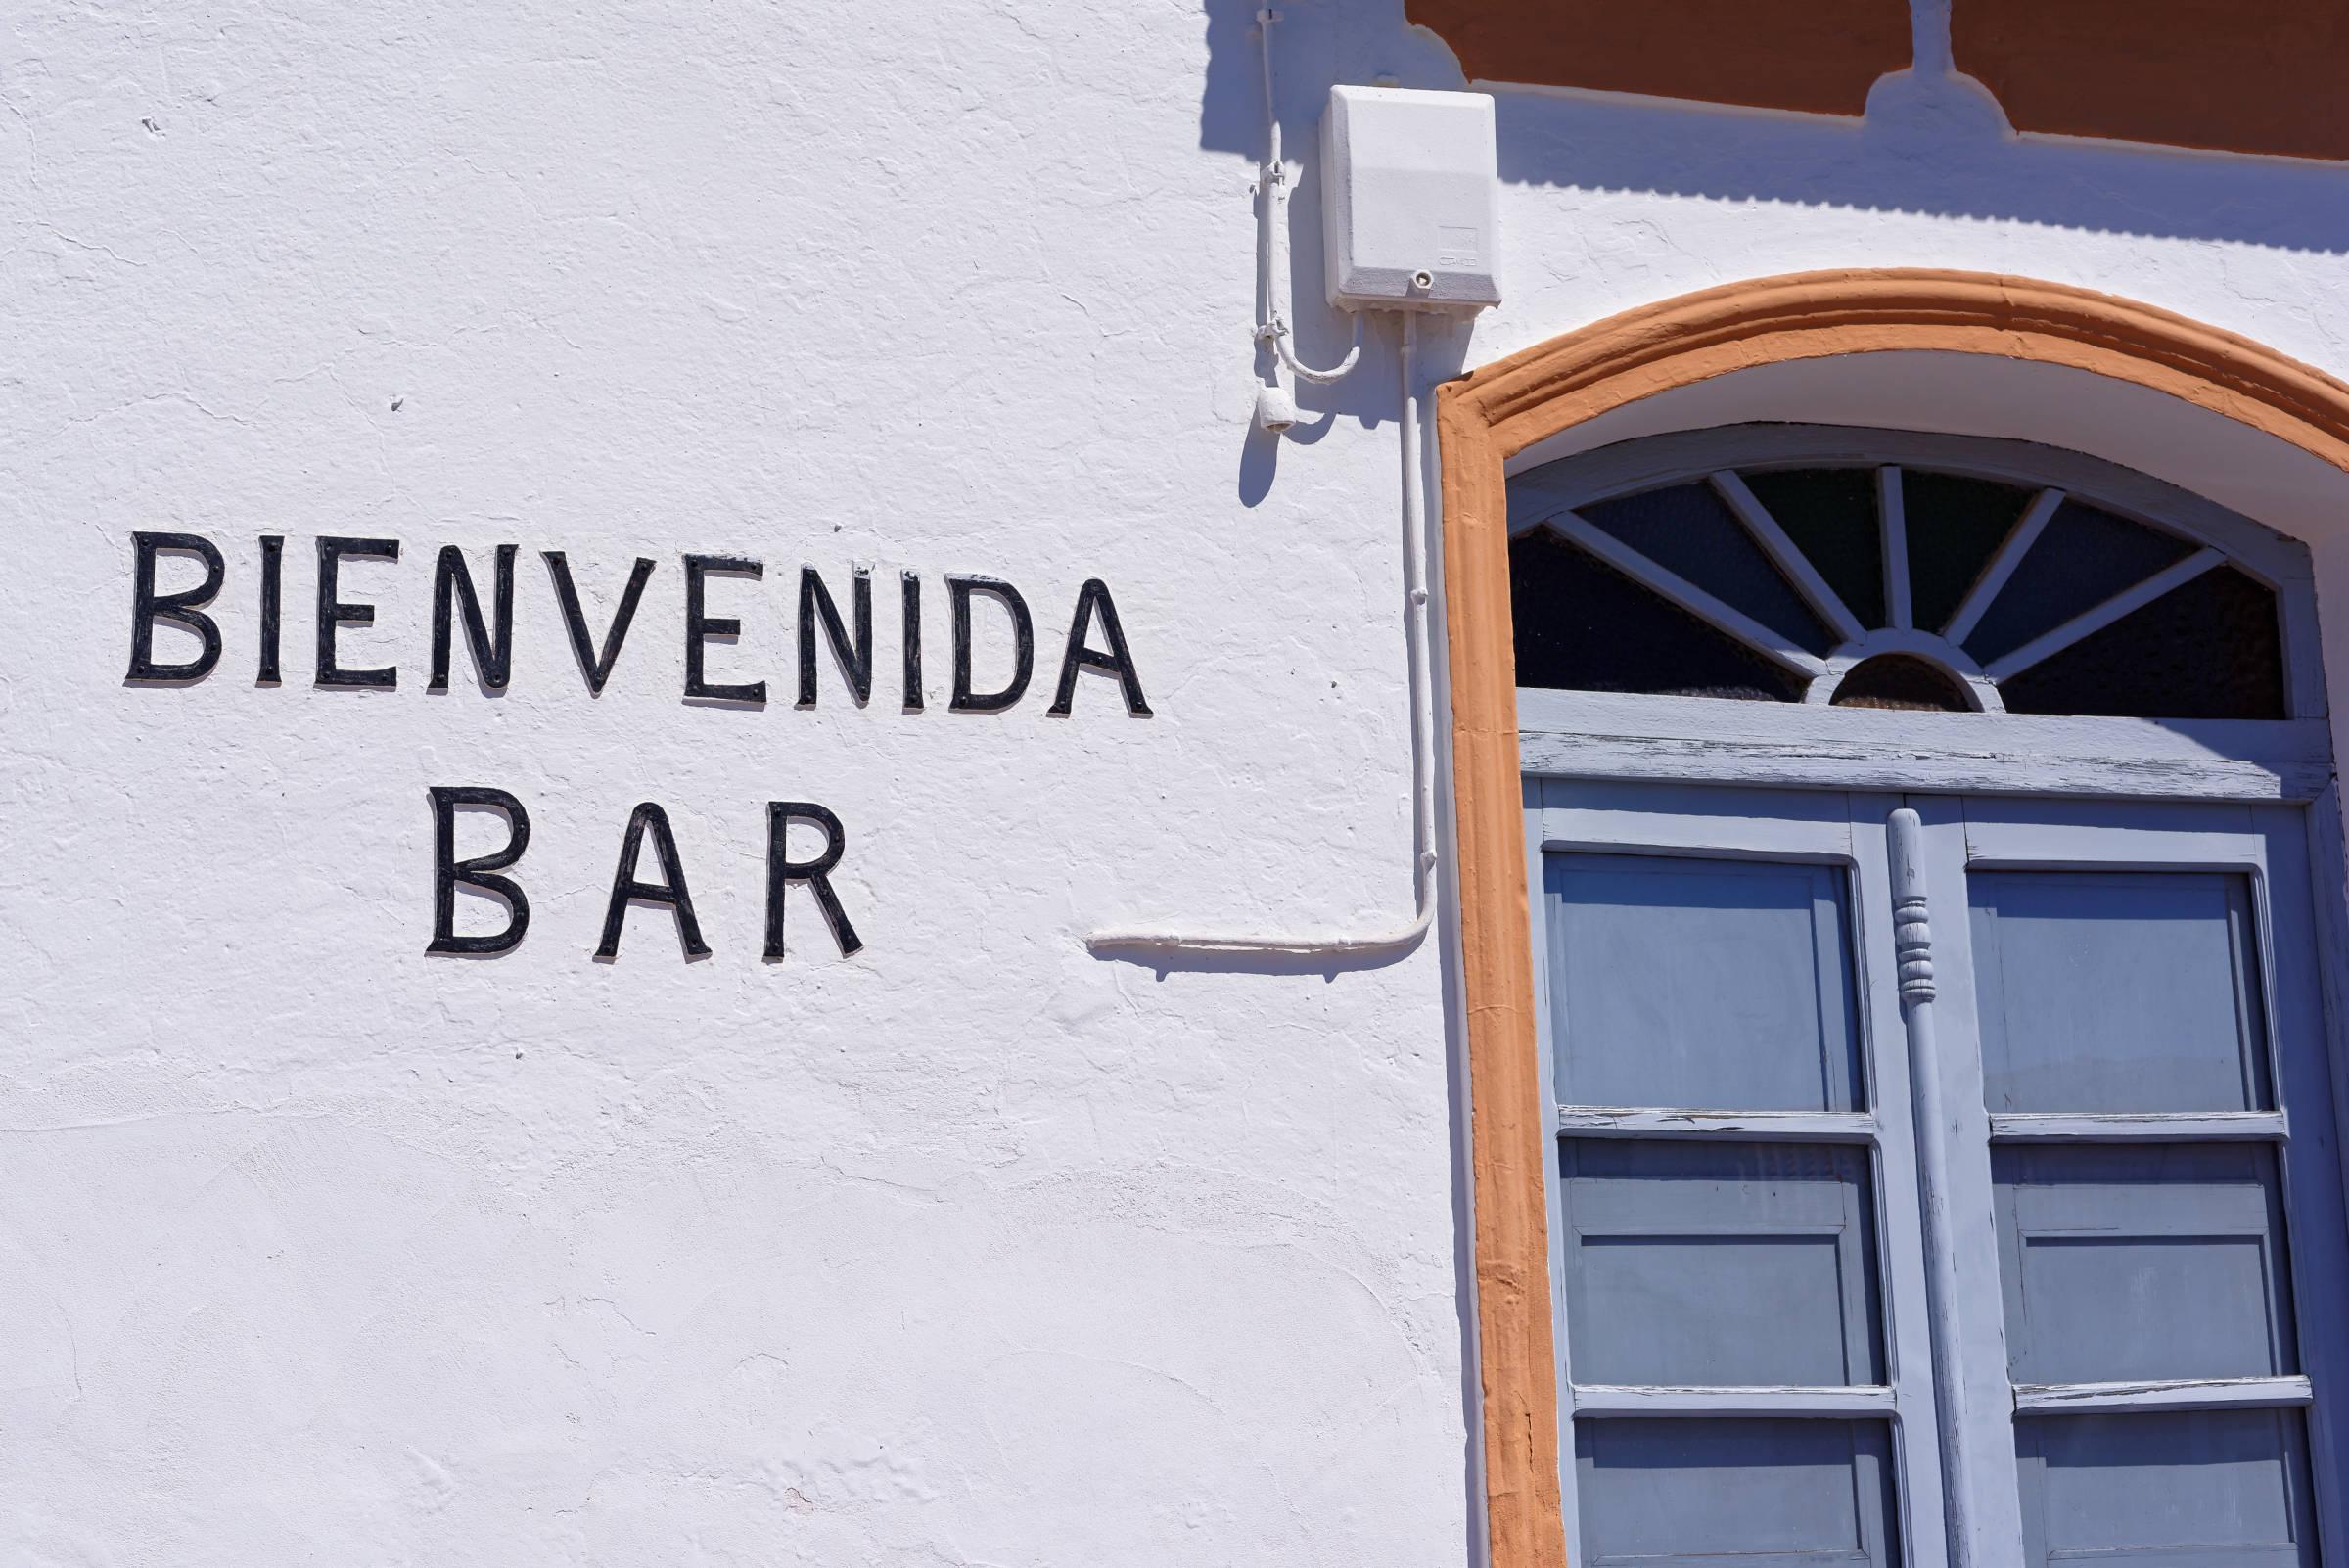 160407-La Albuera (Estremadure) (17)